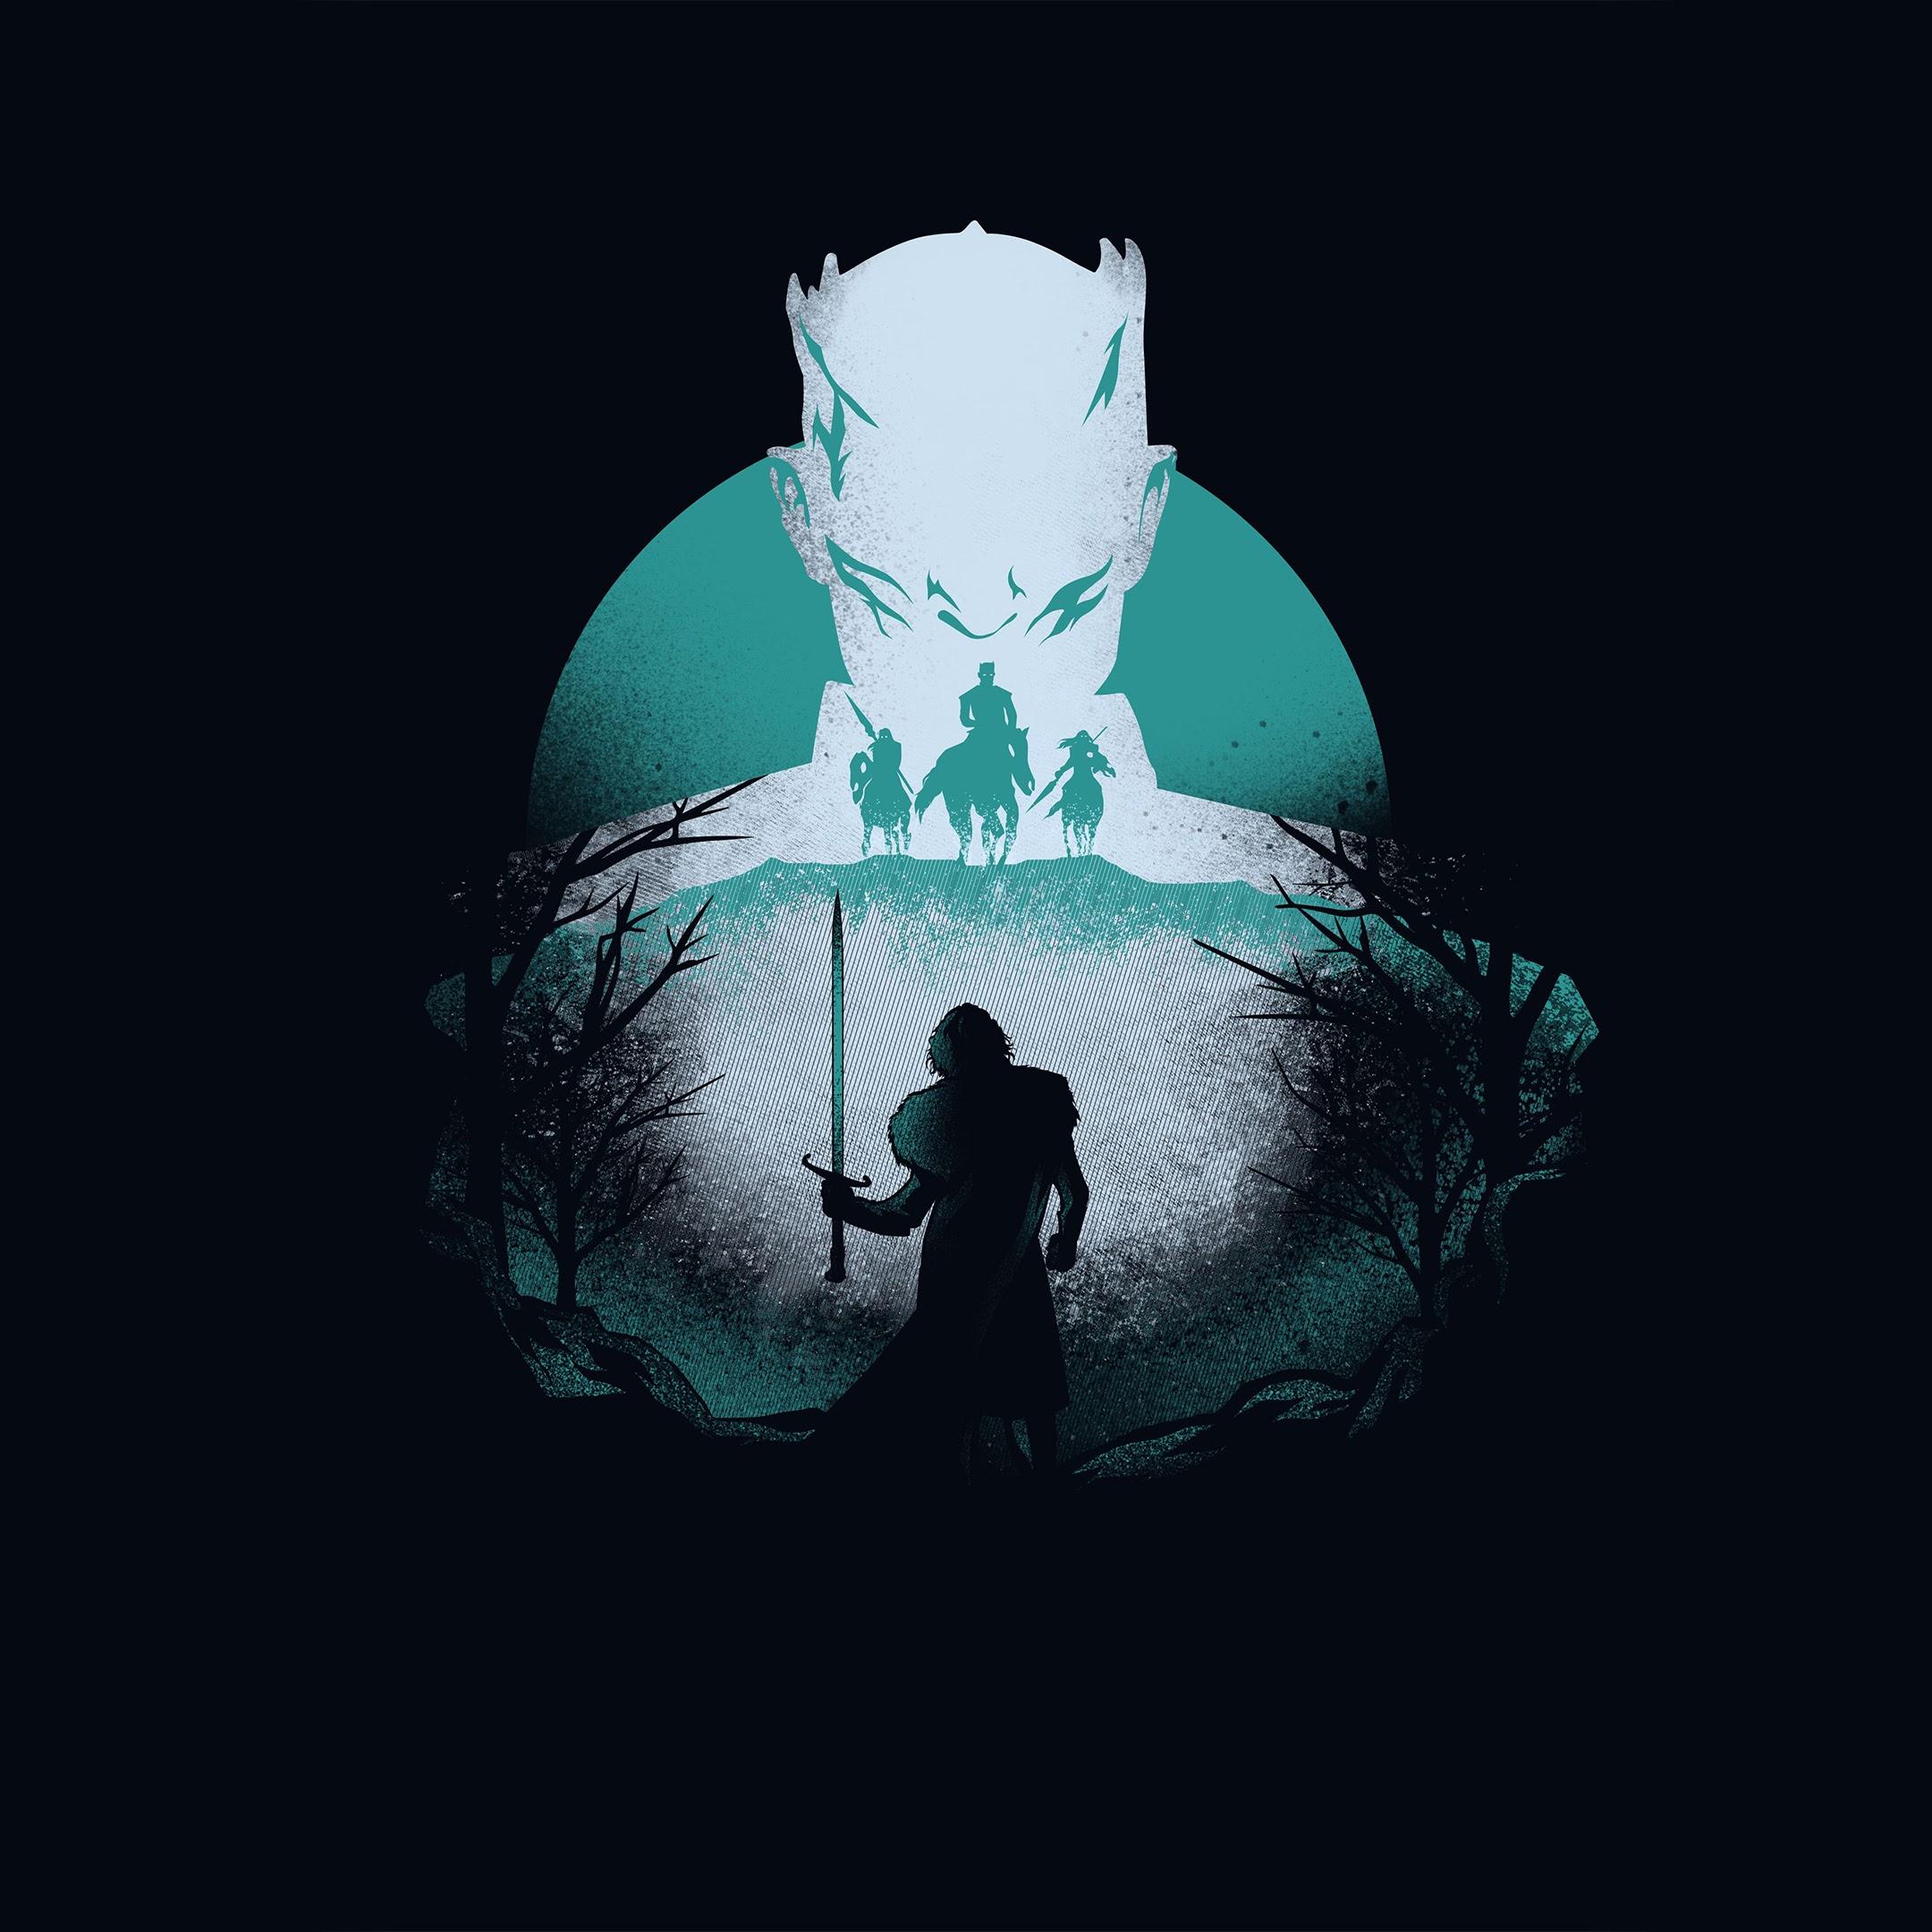 Night King, Jon Snow, Minimalist, Game Of Thrones, 4K, #52